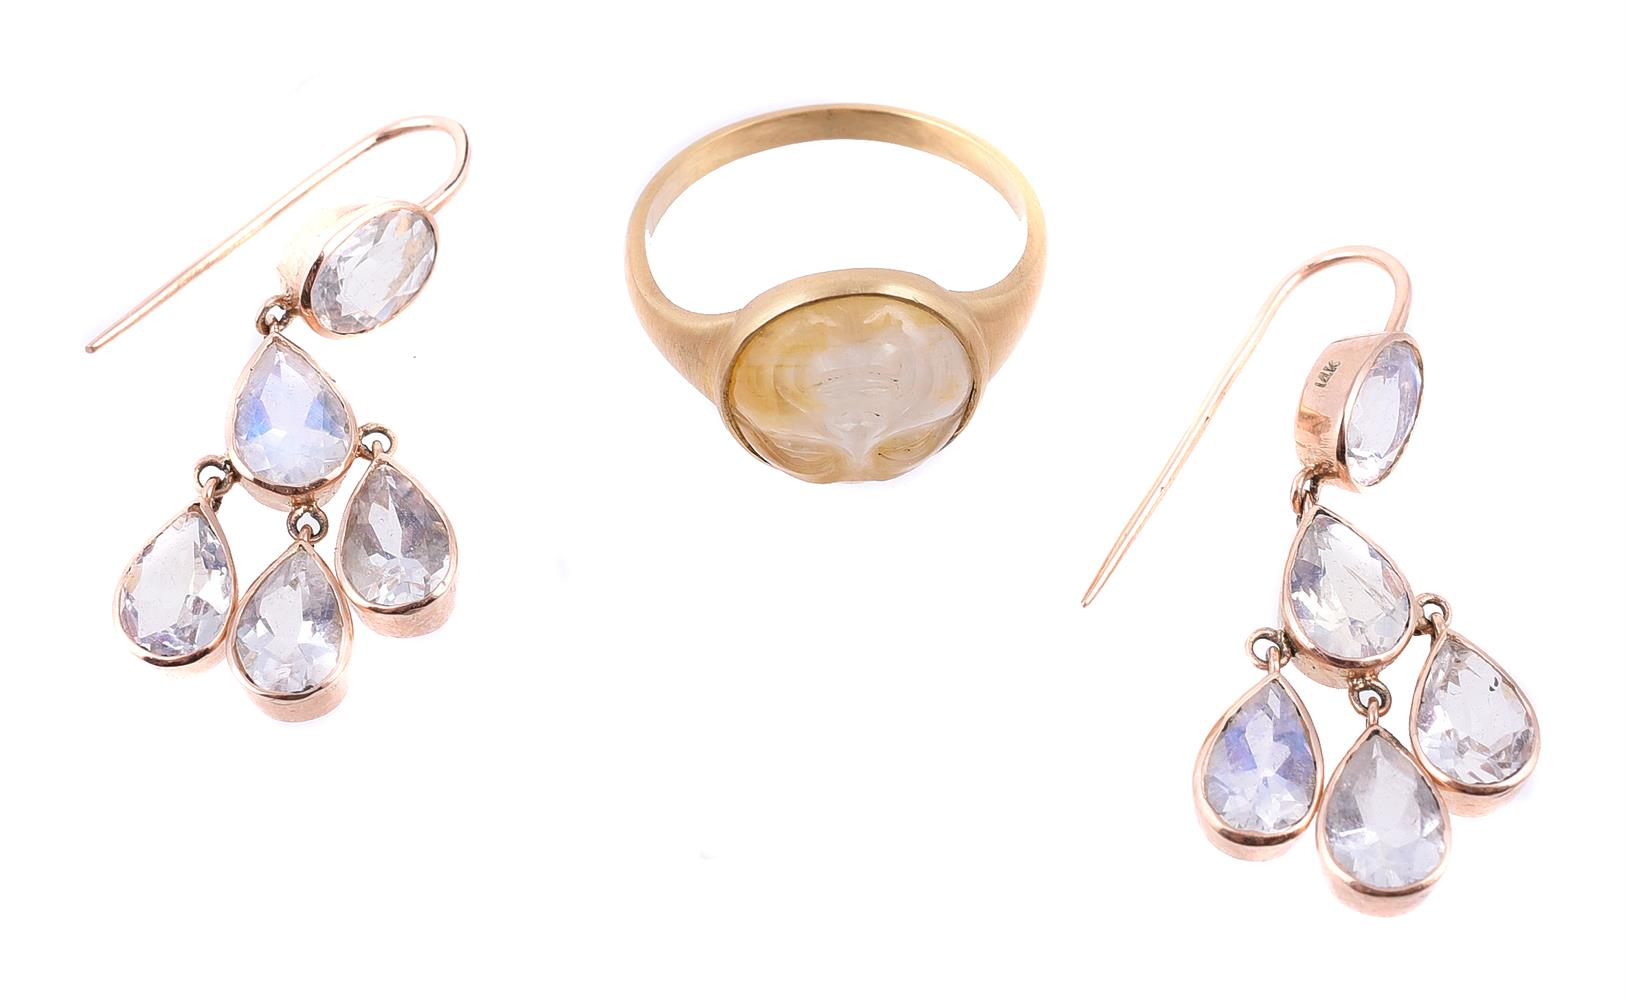 A novelty moonstone ring